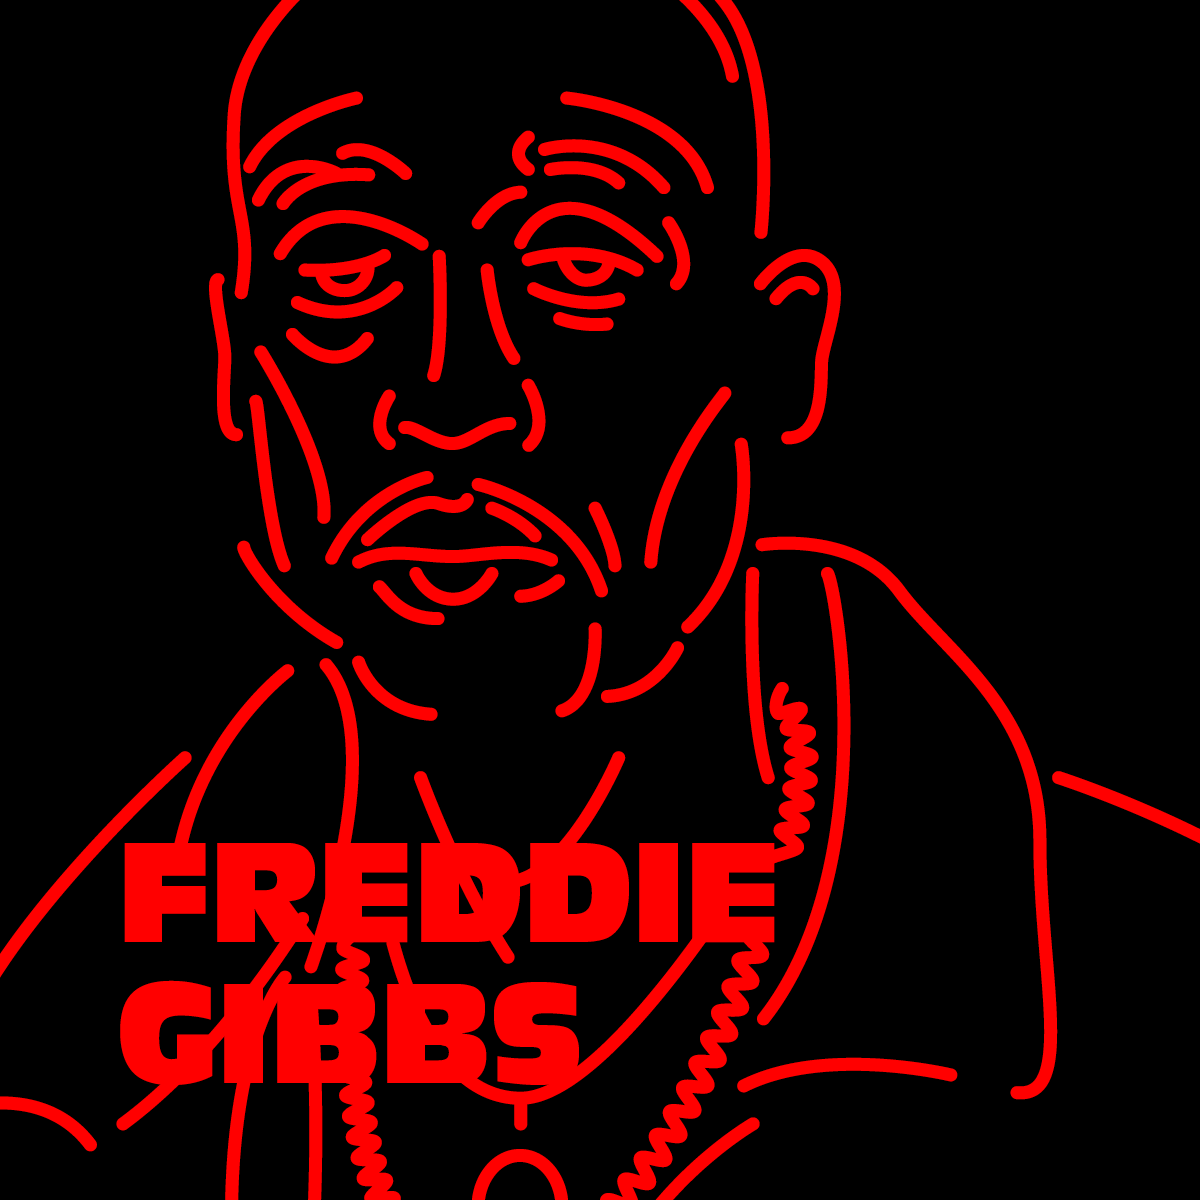 Freddie Gibbs zamyka line-up HHK 2019!